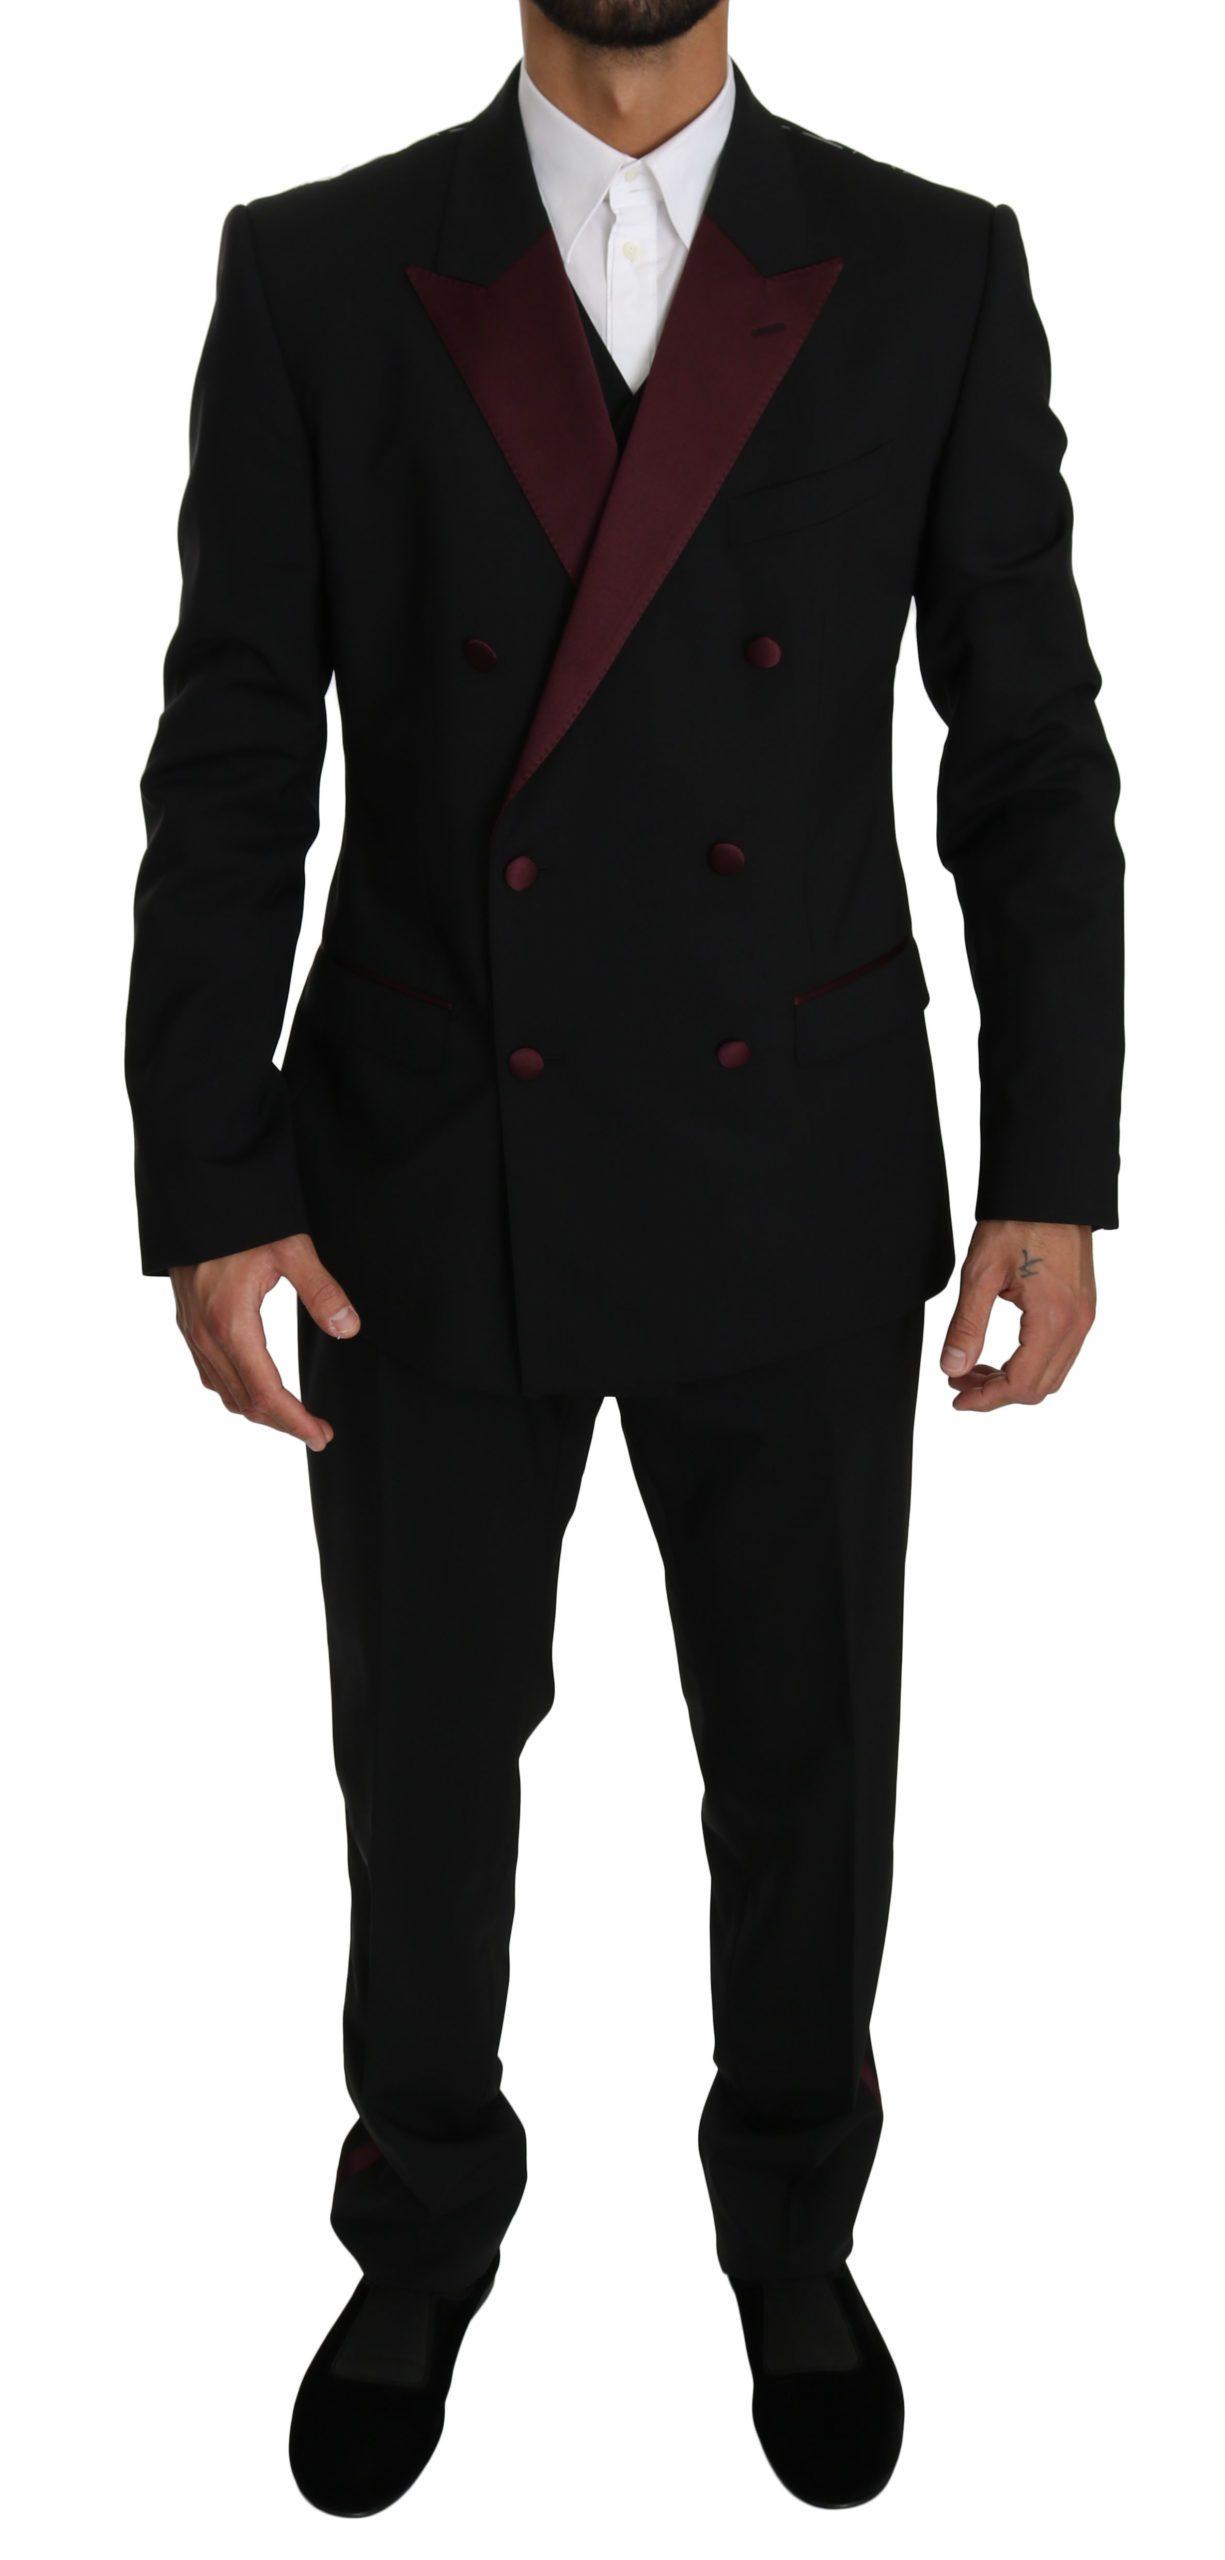 Dolce & Gabbana Men's Double Breasted 3 Piece MARTINI Suit Black KOS1607 - IT50 | L